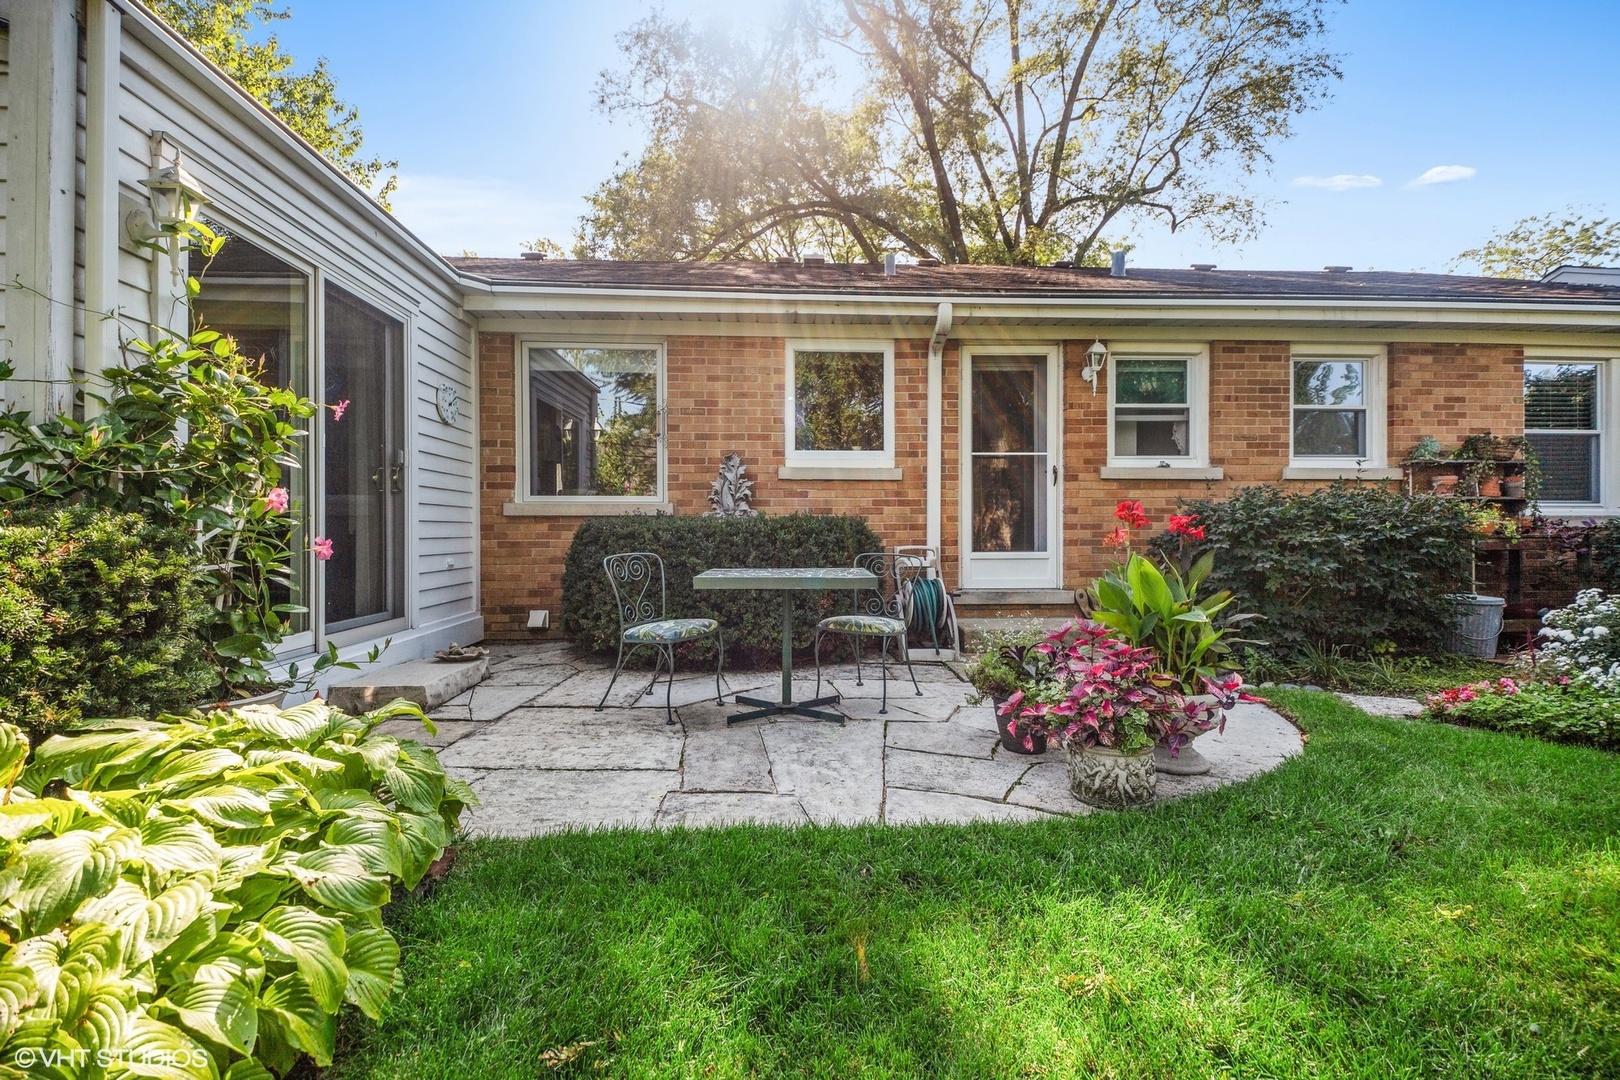 2138 Robincrest, Glenview, Illinois, 60025